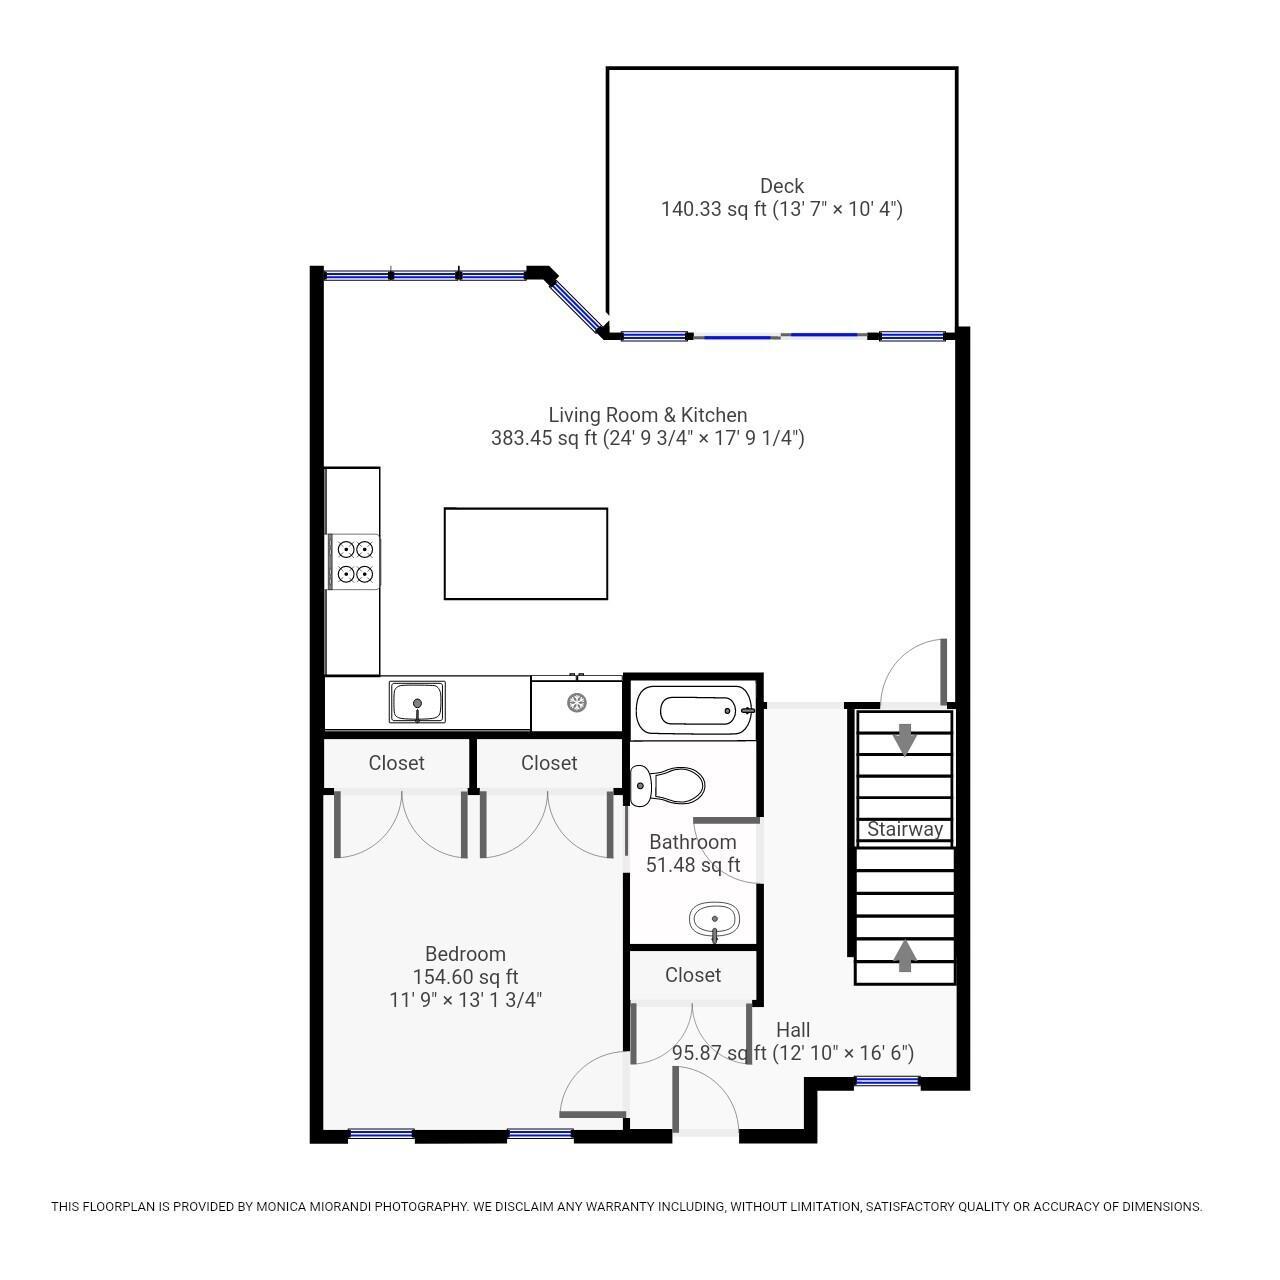 1076 main street chatham ma 02633 property image 33